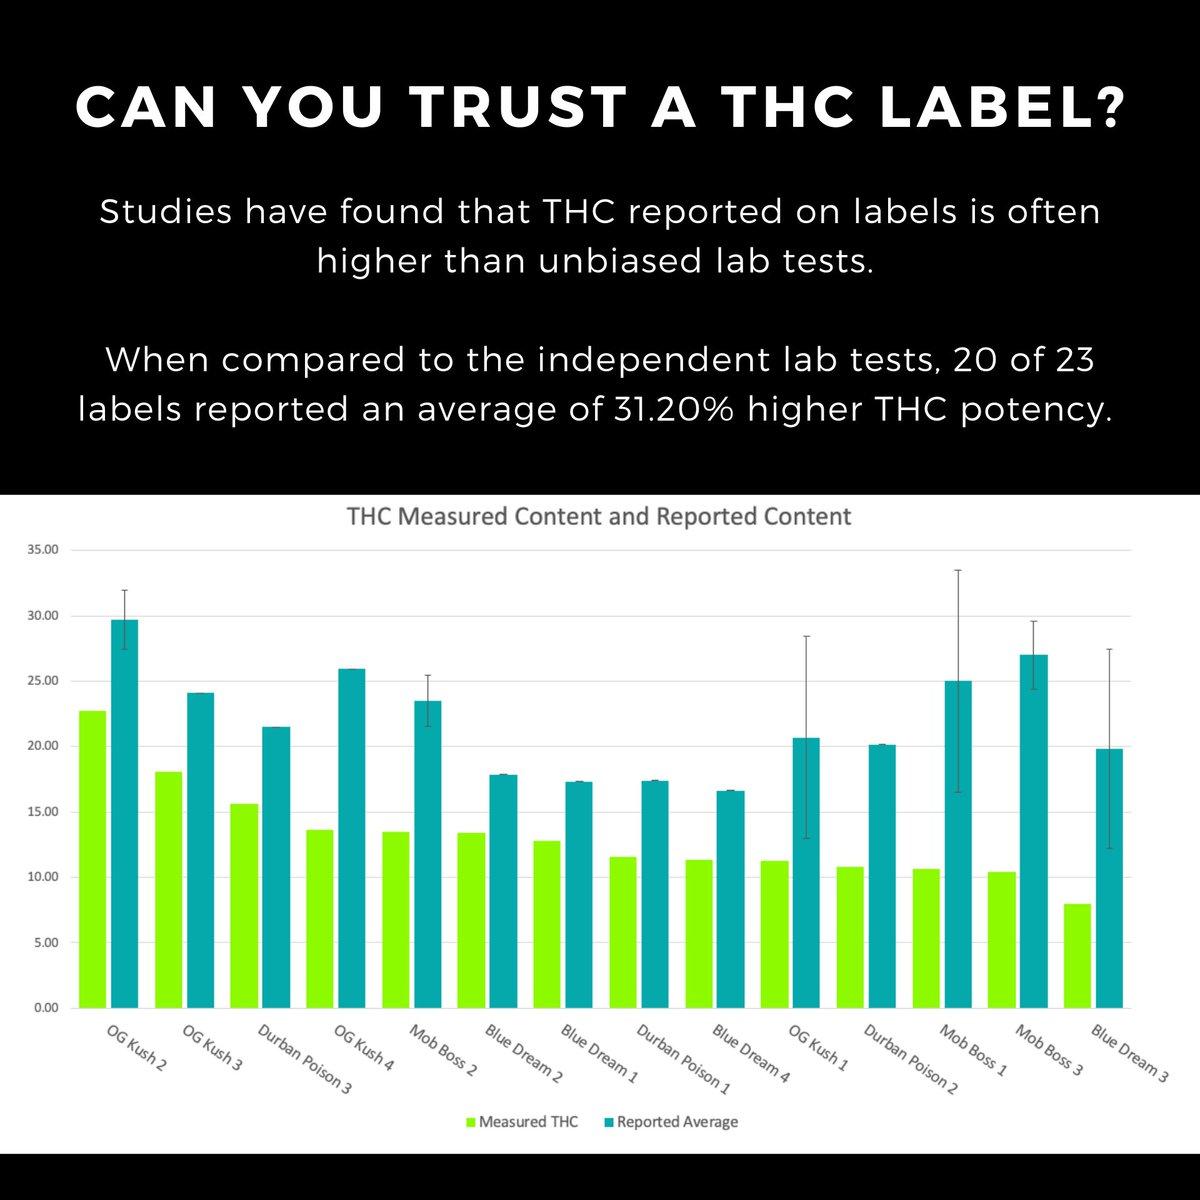 AboutCannabis: Can you trust a potency label? Eh...  - Dr. Anna Schwabe, PhD  #curiousaboutcannabis #cannabiseducation #cannabisscience #cannabistesting #cannabisindustry #cannabiscommunity #cannabis